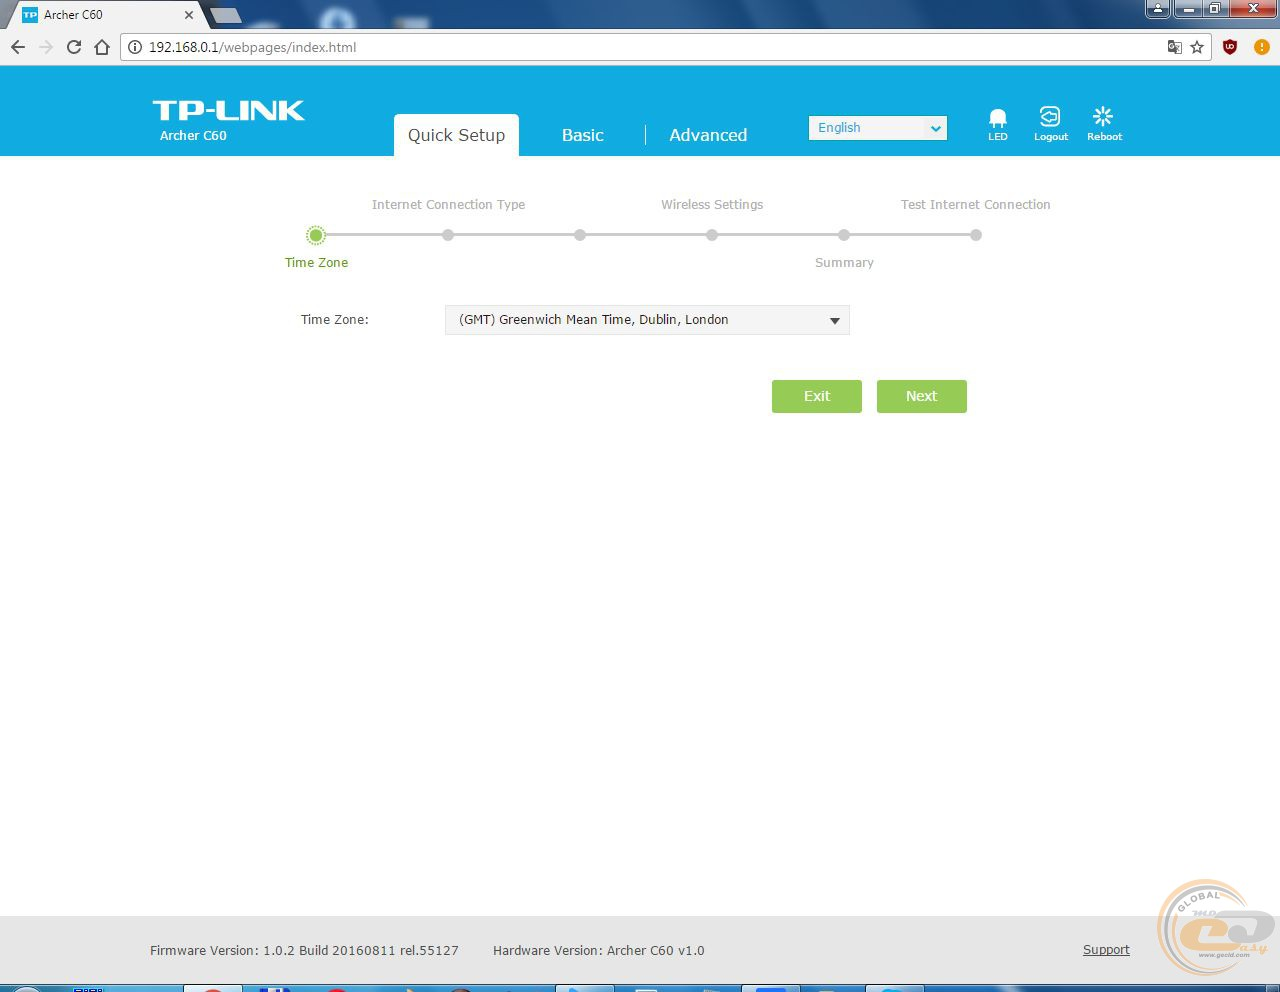 GECID com IT-portal: TP-Link Archer C60